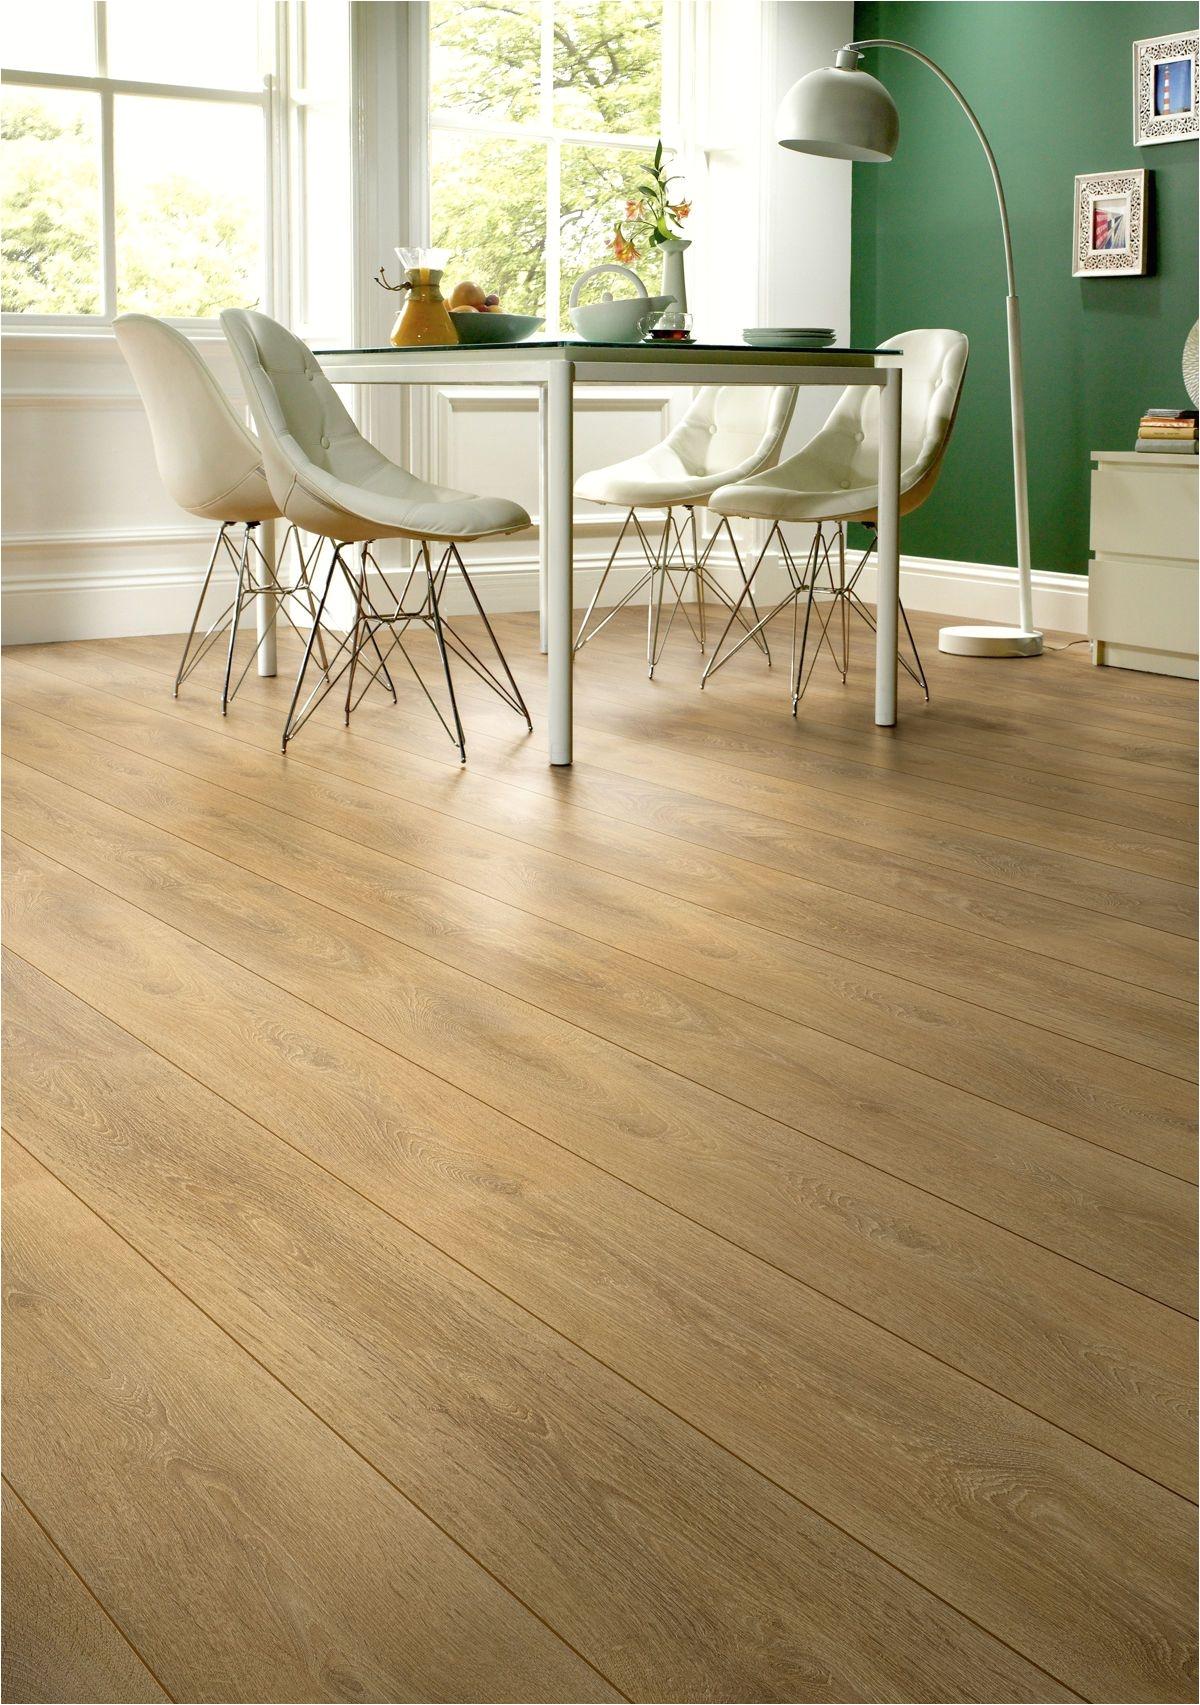 Laminate Flooring Made In Usa Kronospan Supernatural 12mm Harlech Oak Laminate Flooring